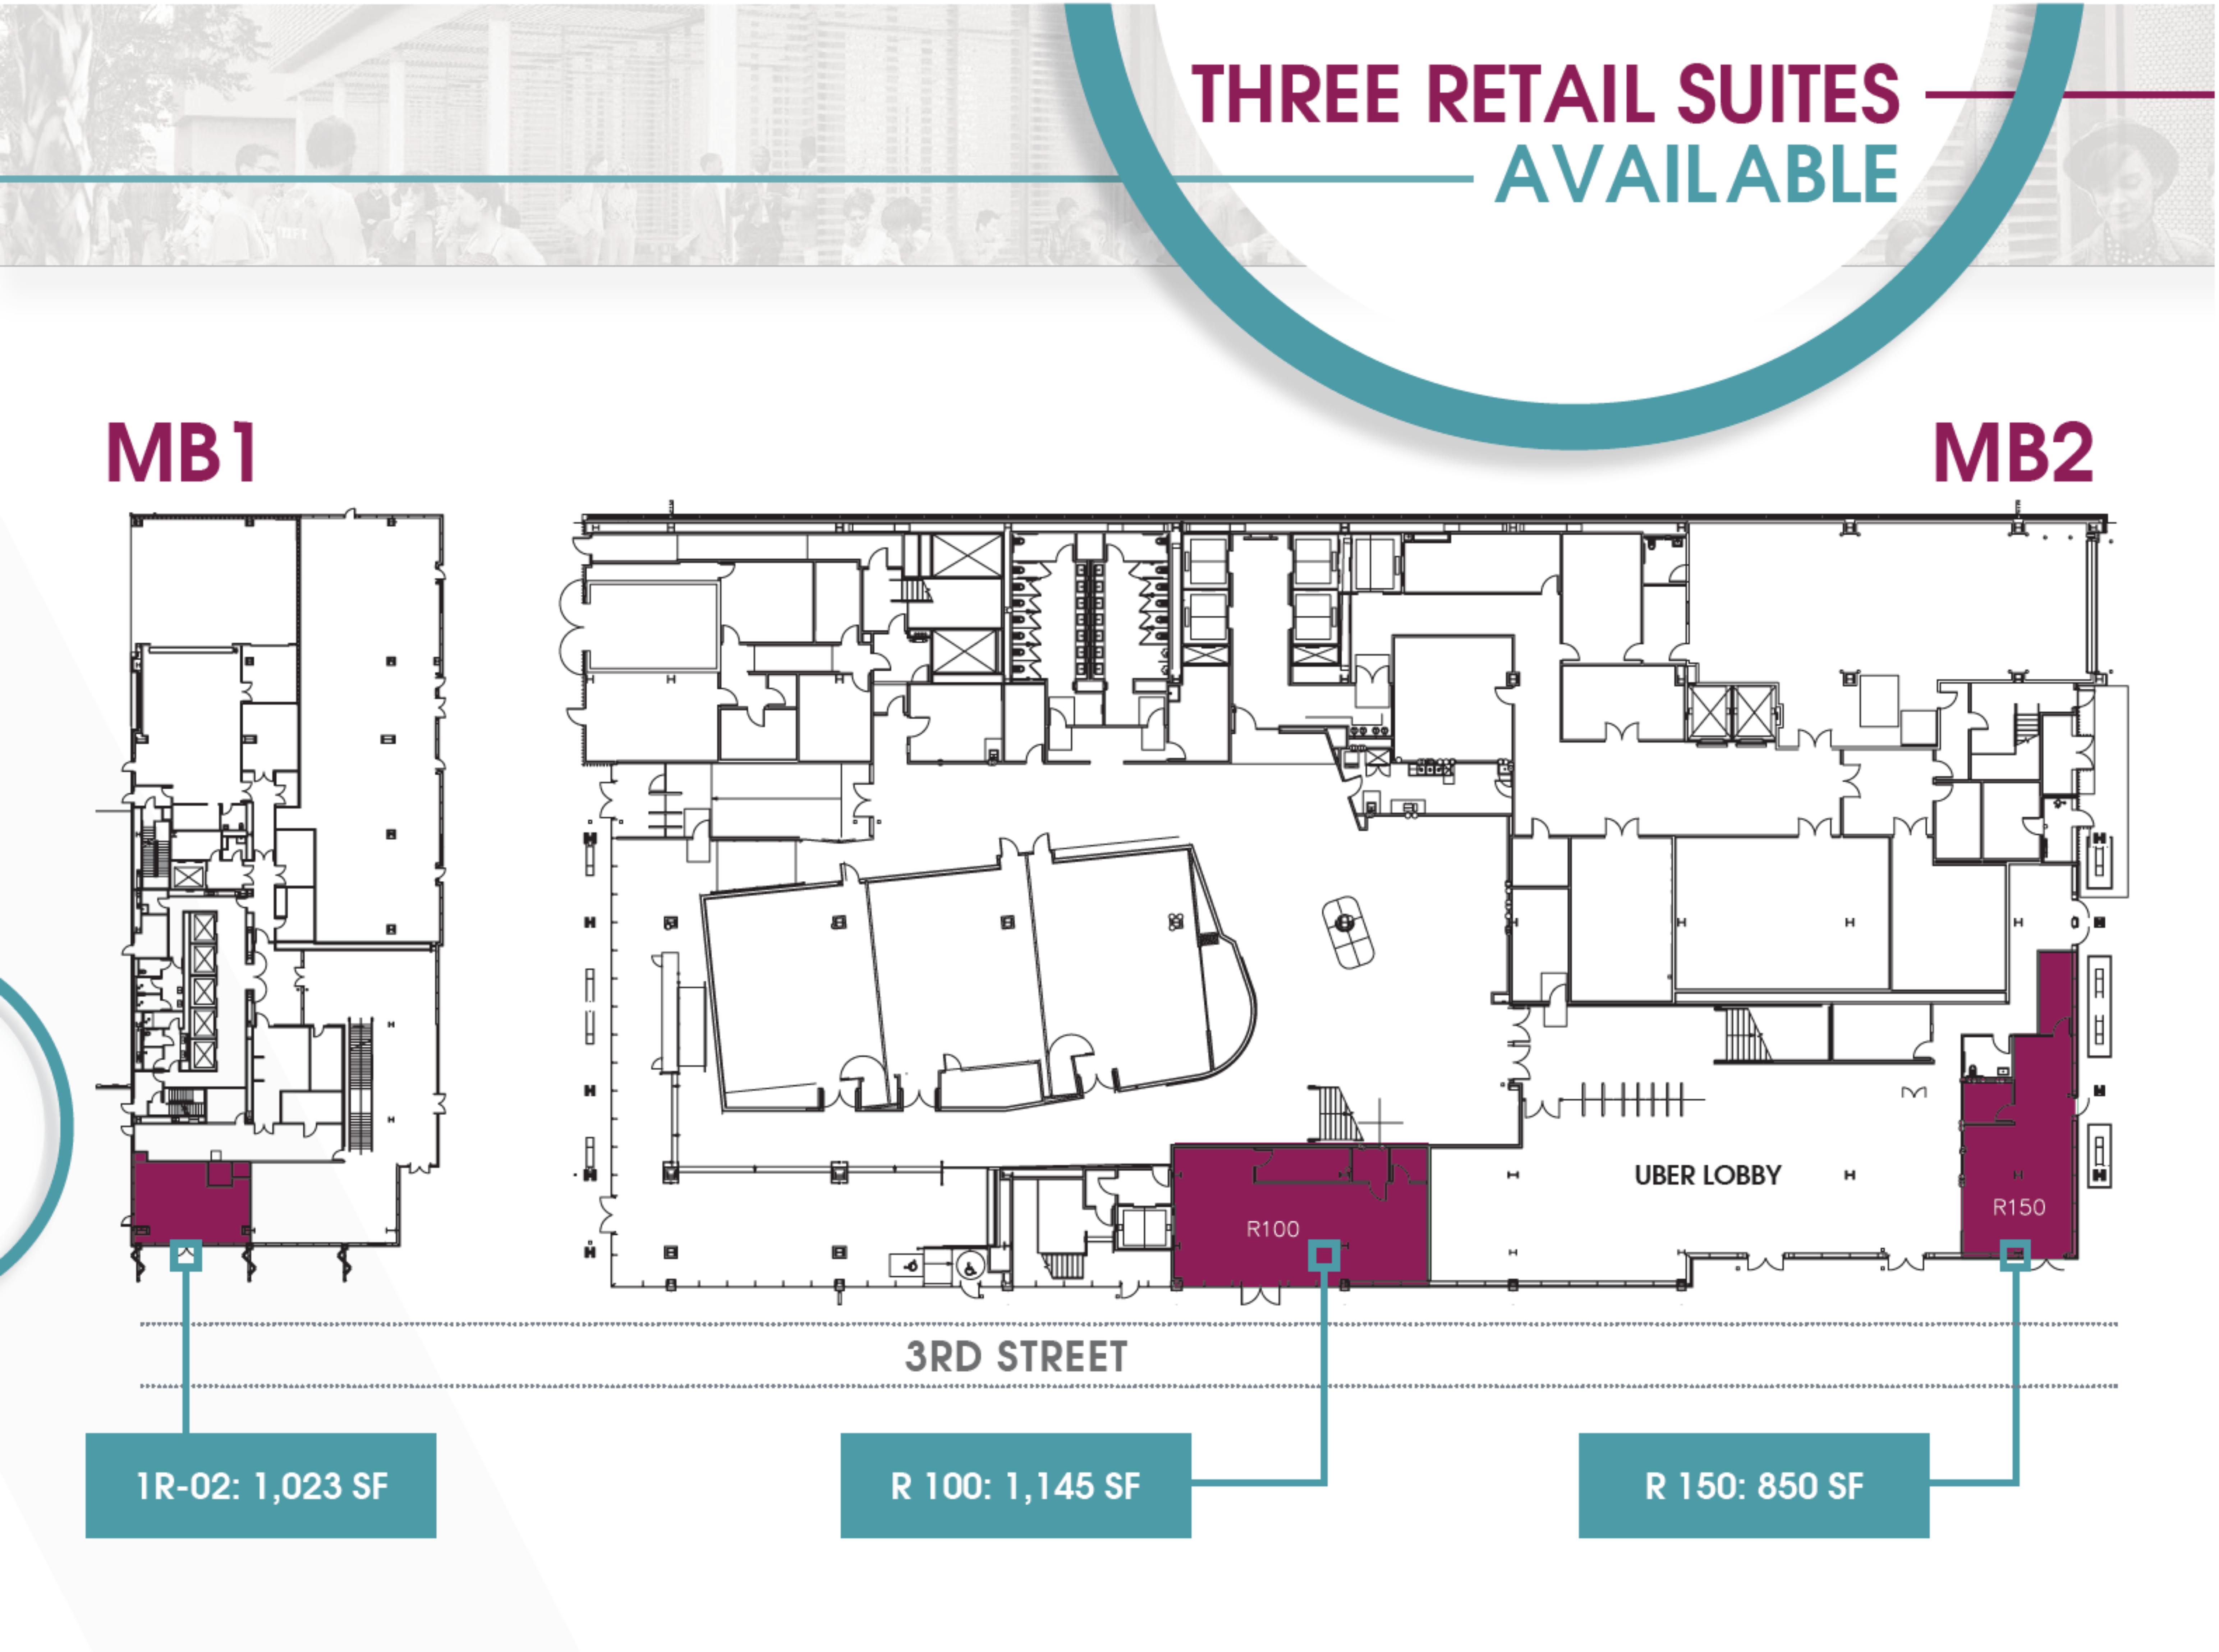 Uber HQ - 1455 3rd Street: site plan